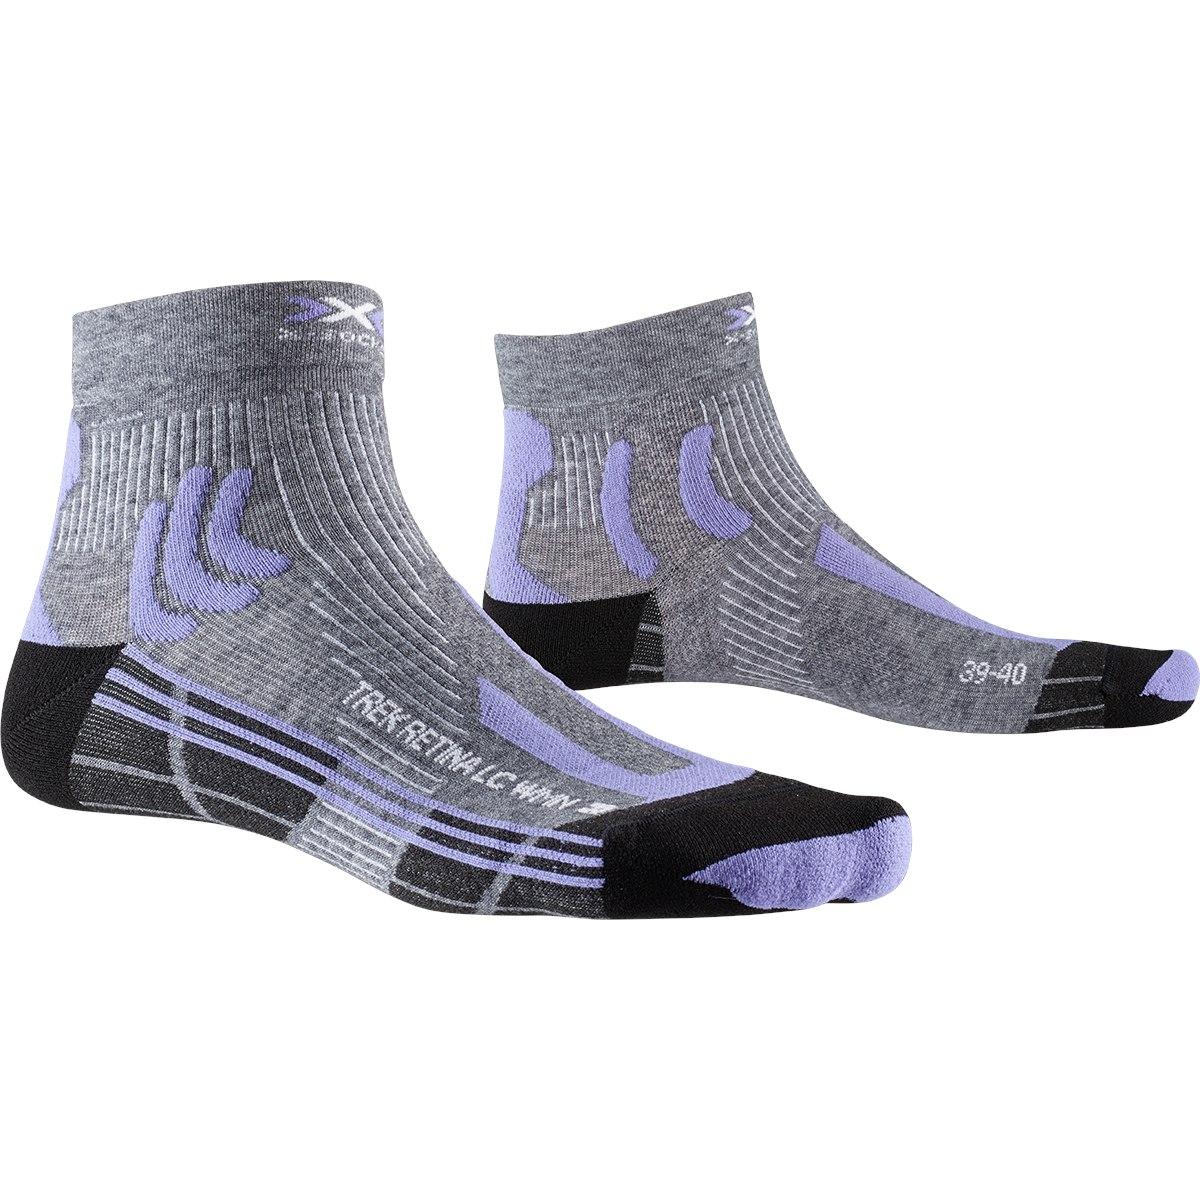 Bild von X-Socks Trek Retina 4.0 Low Cut Damen Socken - grey multi melange/dust